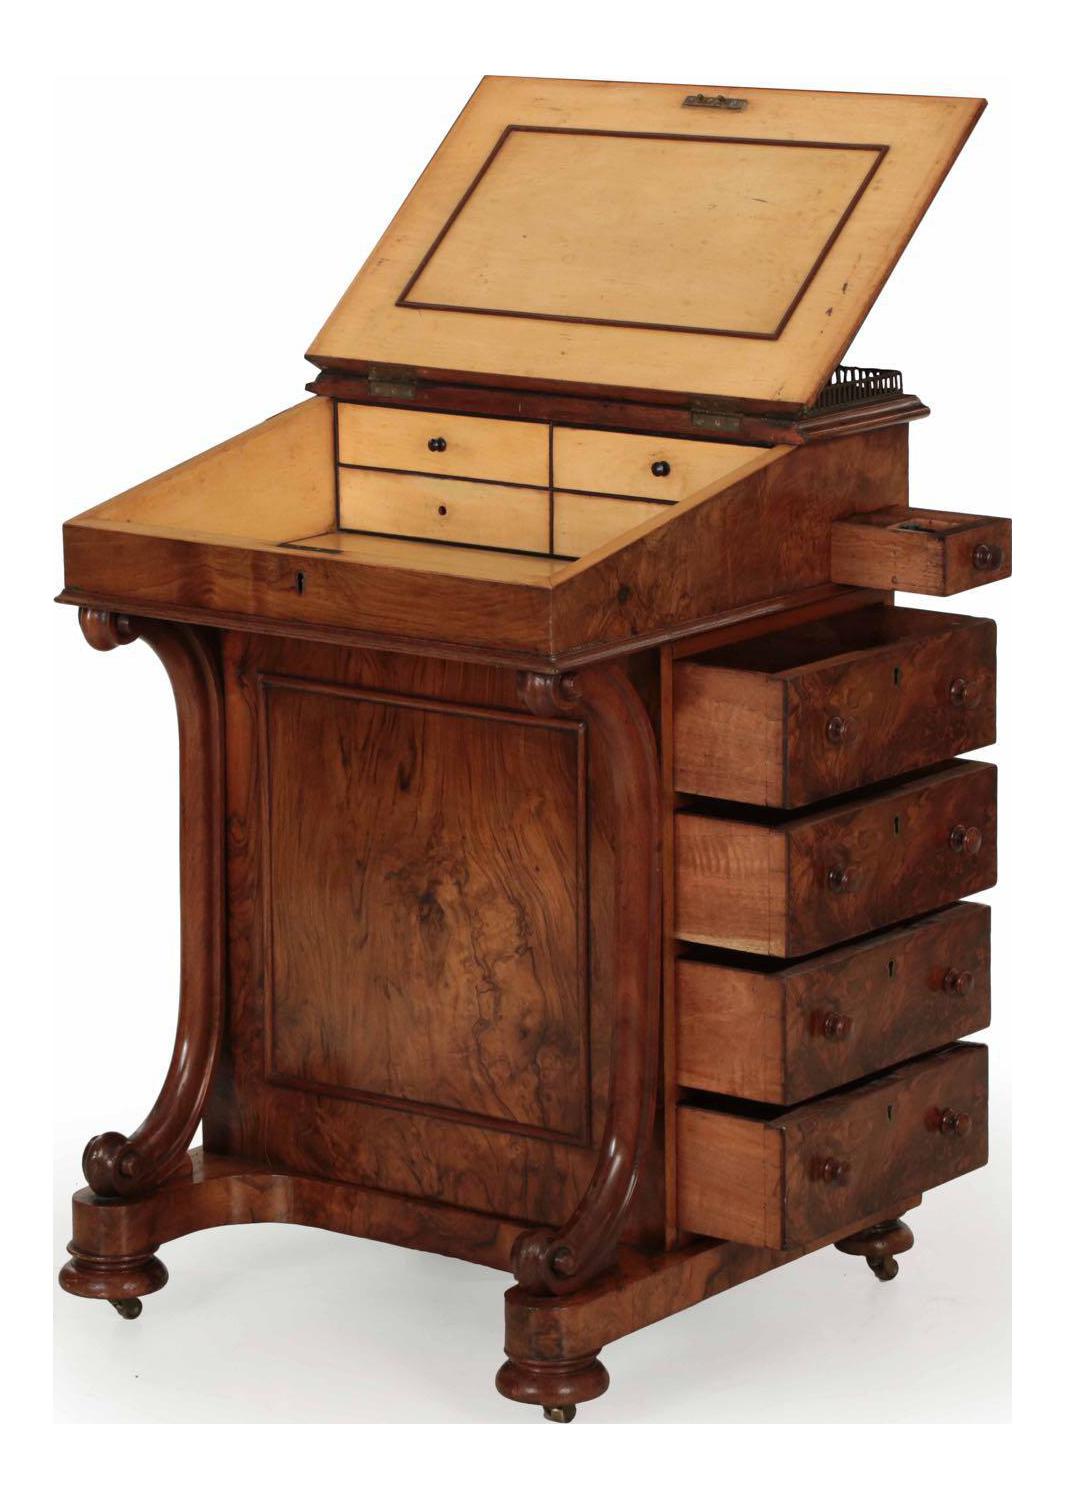 19th Century William Iv Walnut Leather Davenport Antique Desk Antique Furniture Furniture Antique Desk